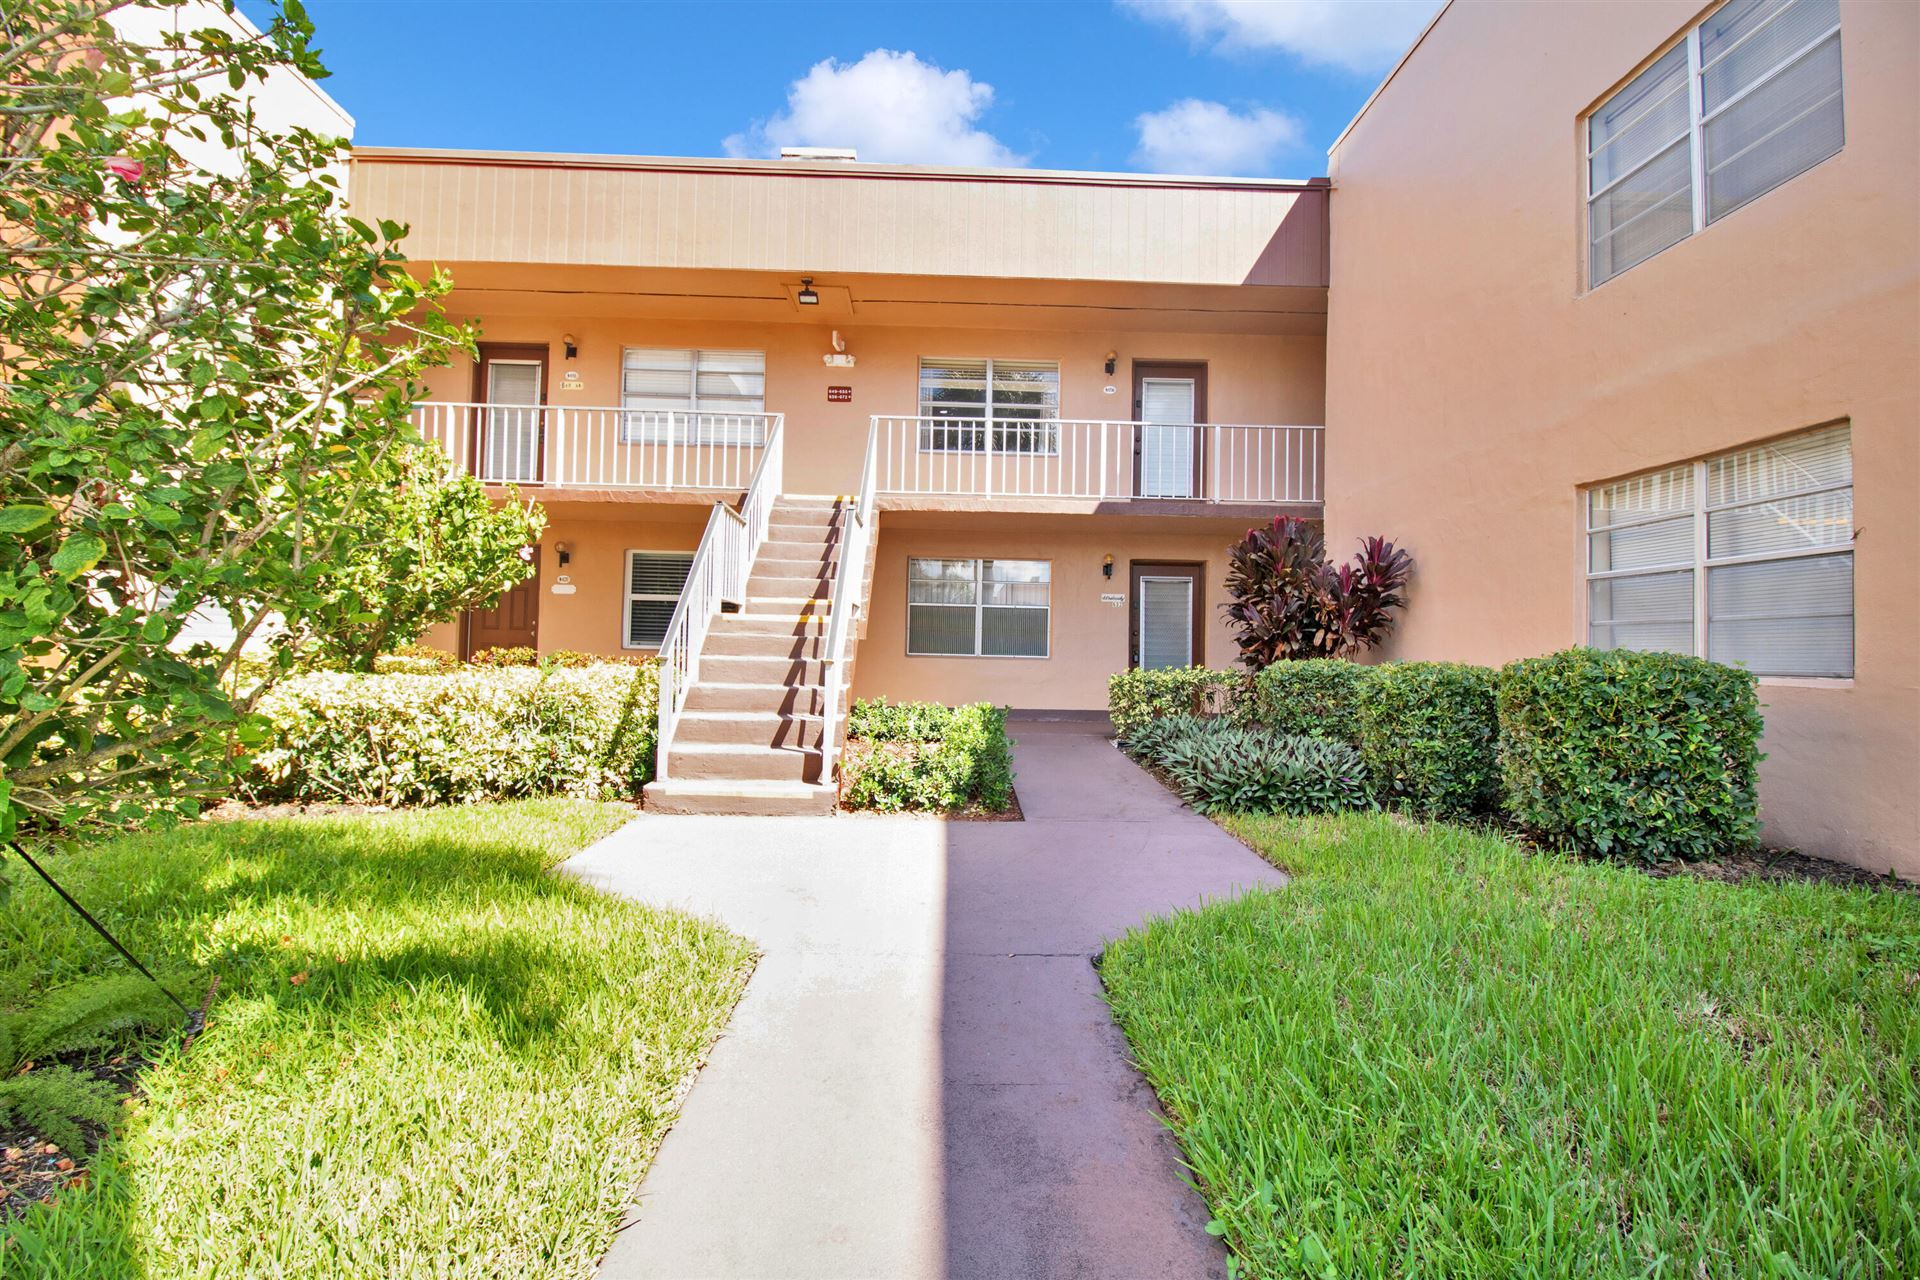 656 Burgundy N, Delray Beach, FL 33484 - MLS#: RX-10751935